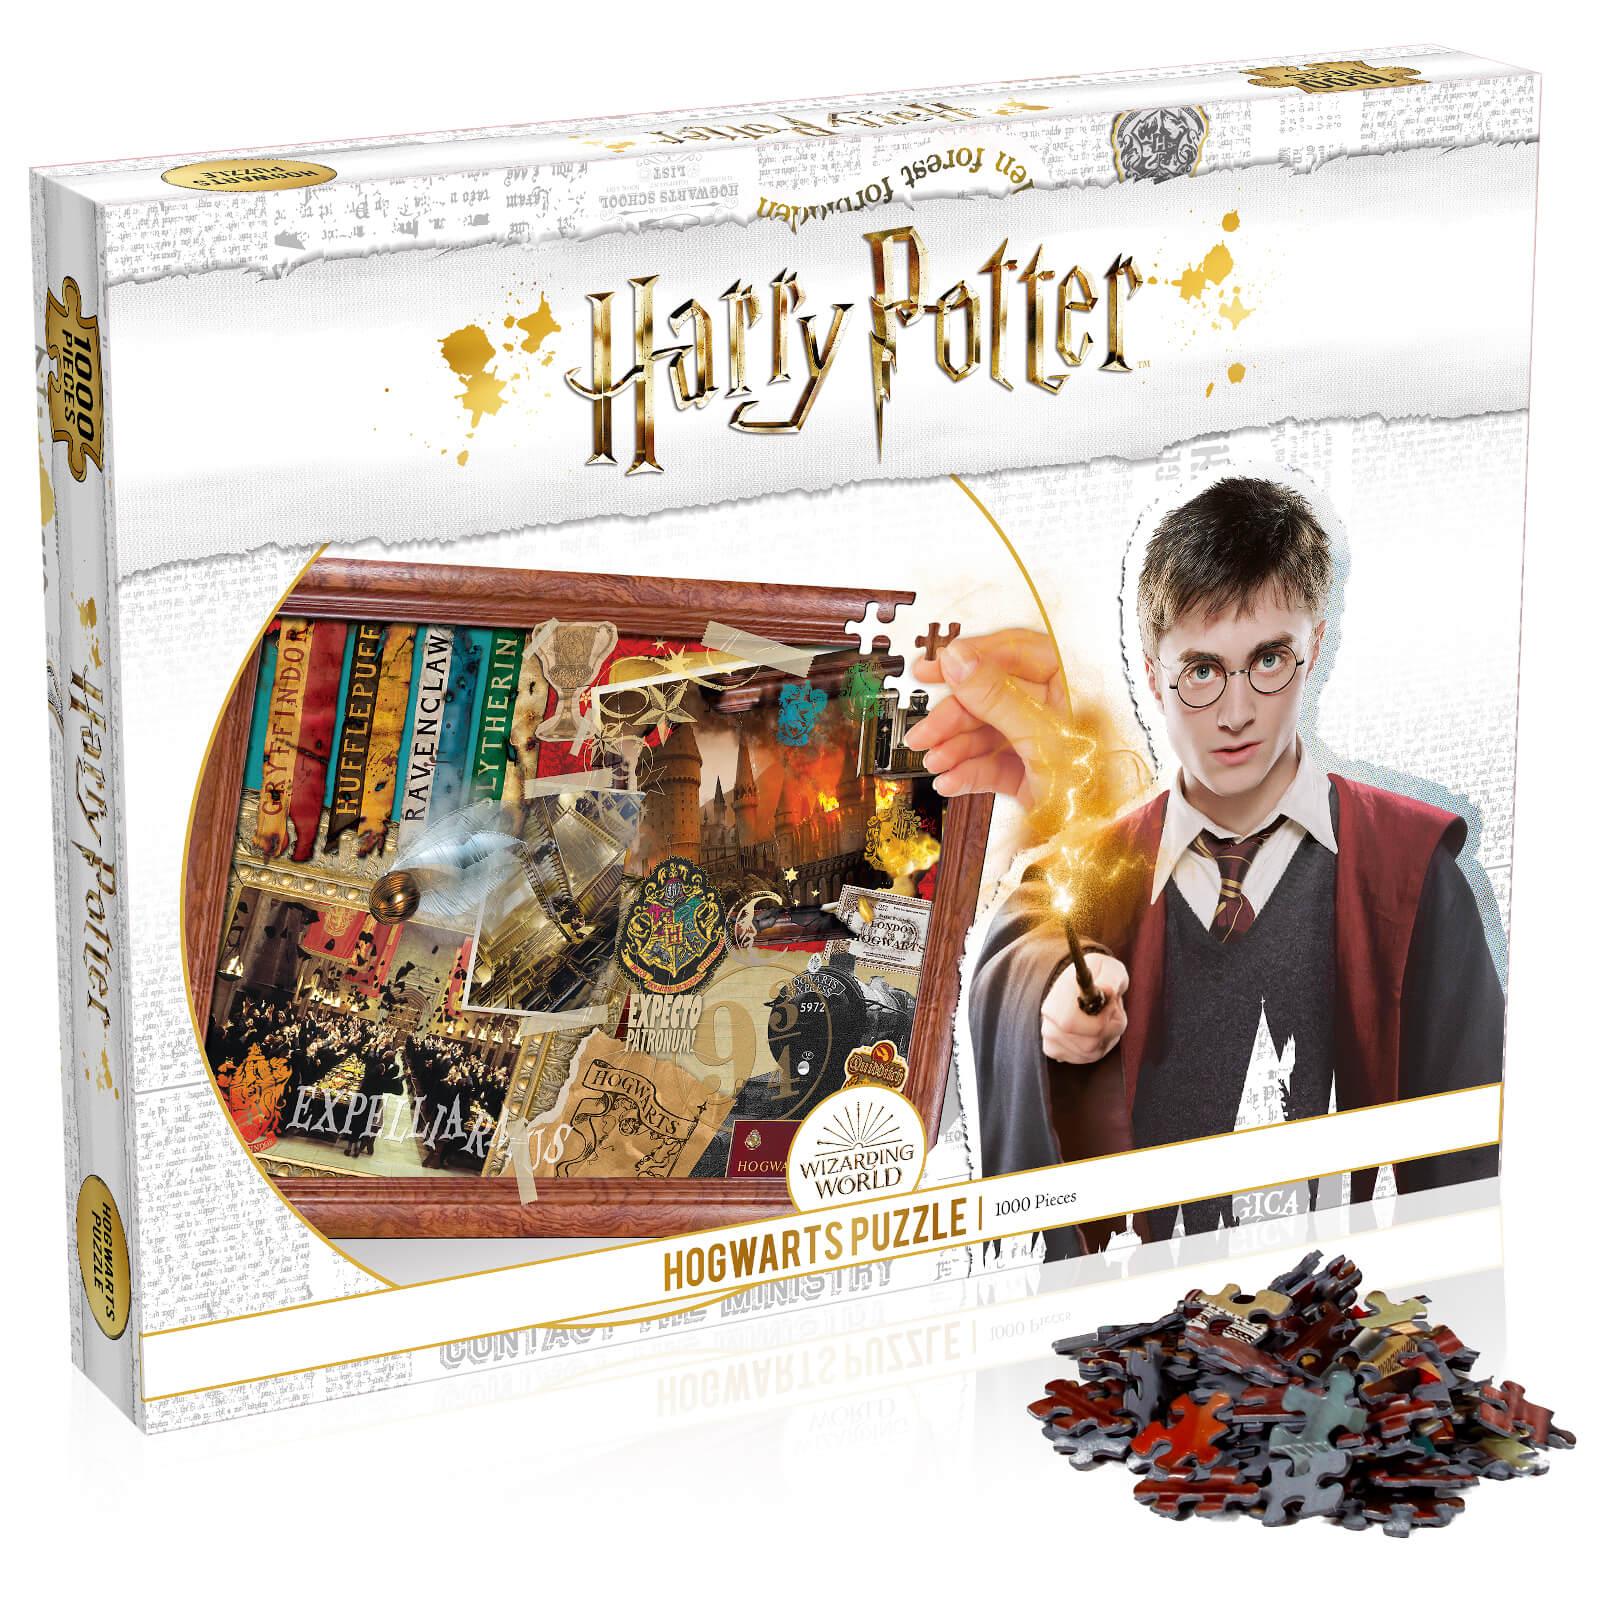 1000 Piece Jigsaw Puzzle – Harry Potter Hogwarts Edition